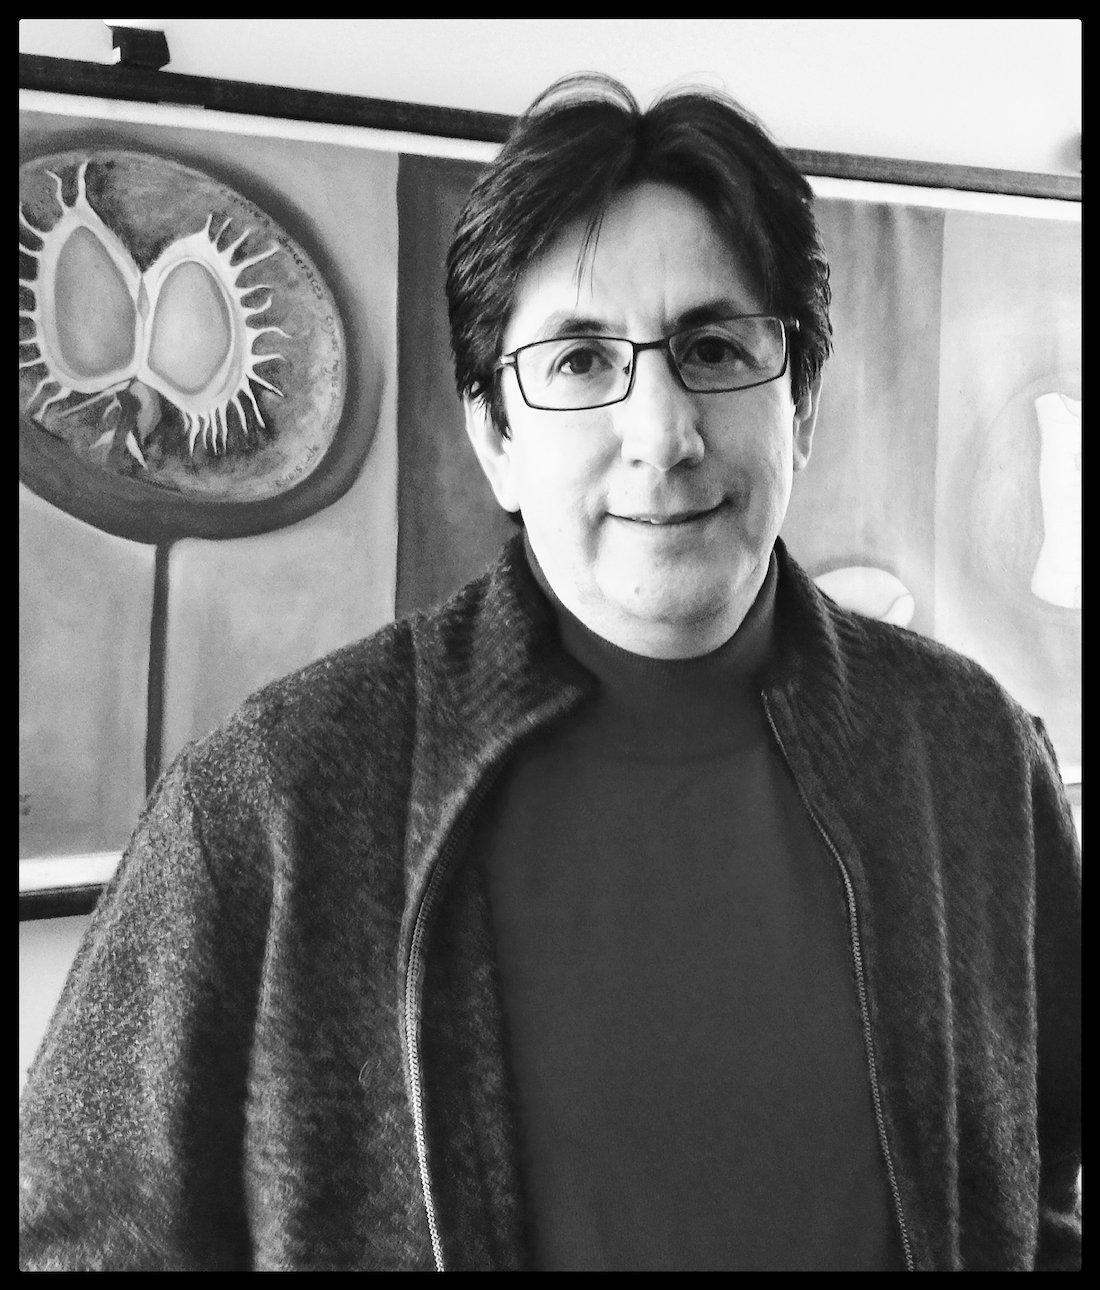 Juan Campoverde